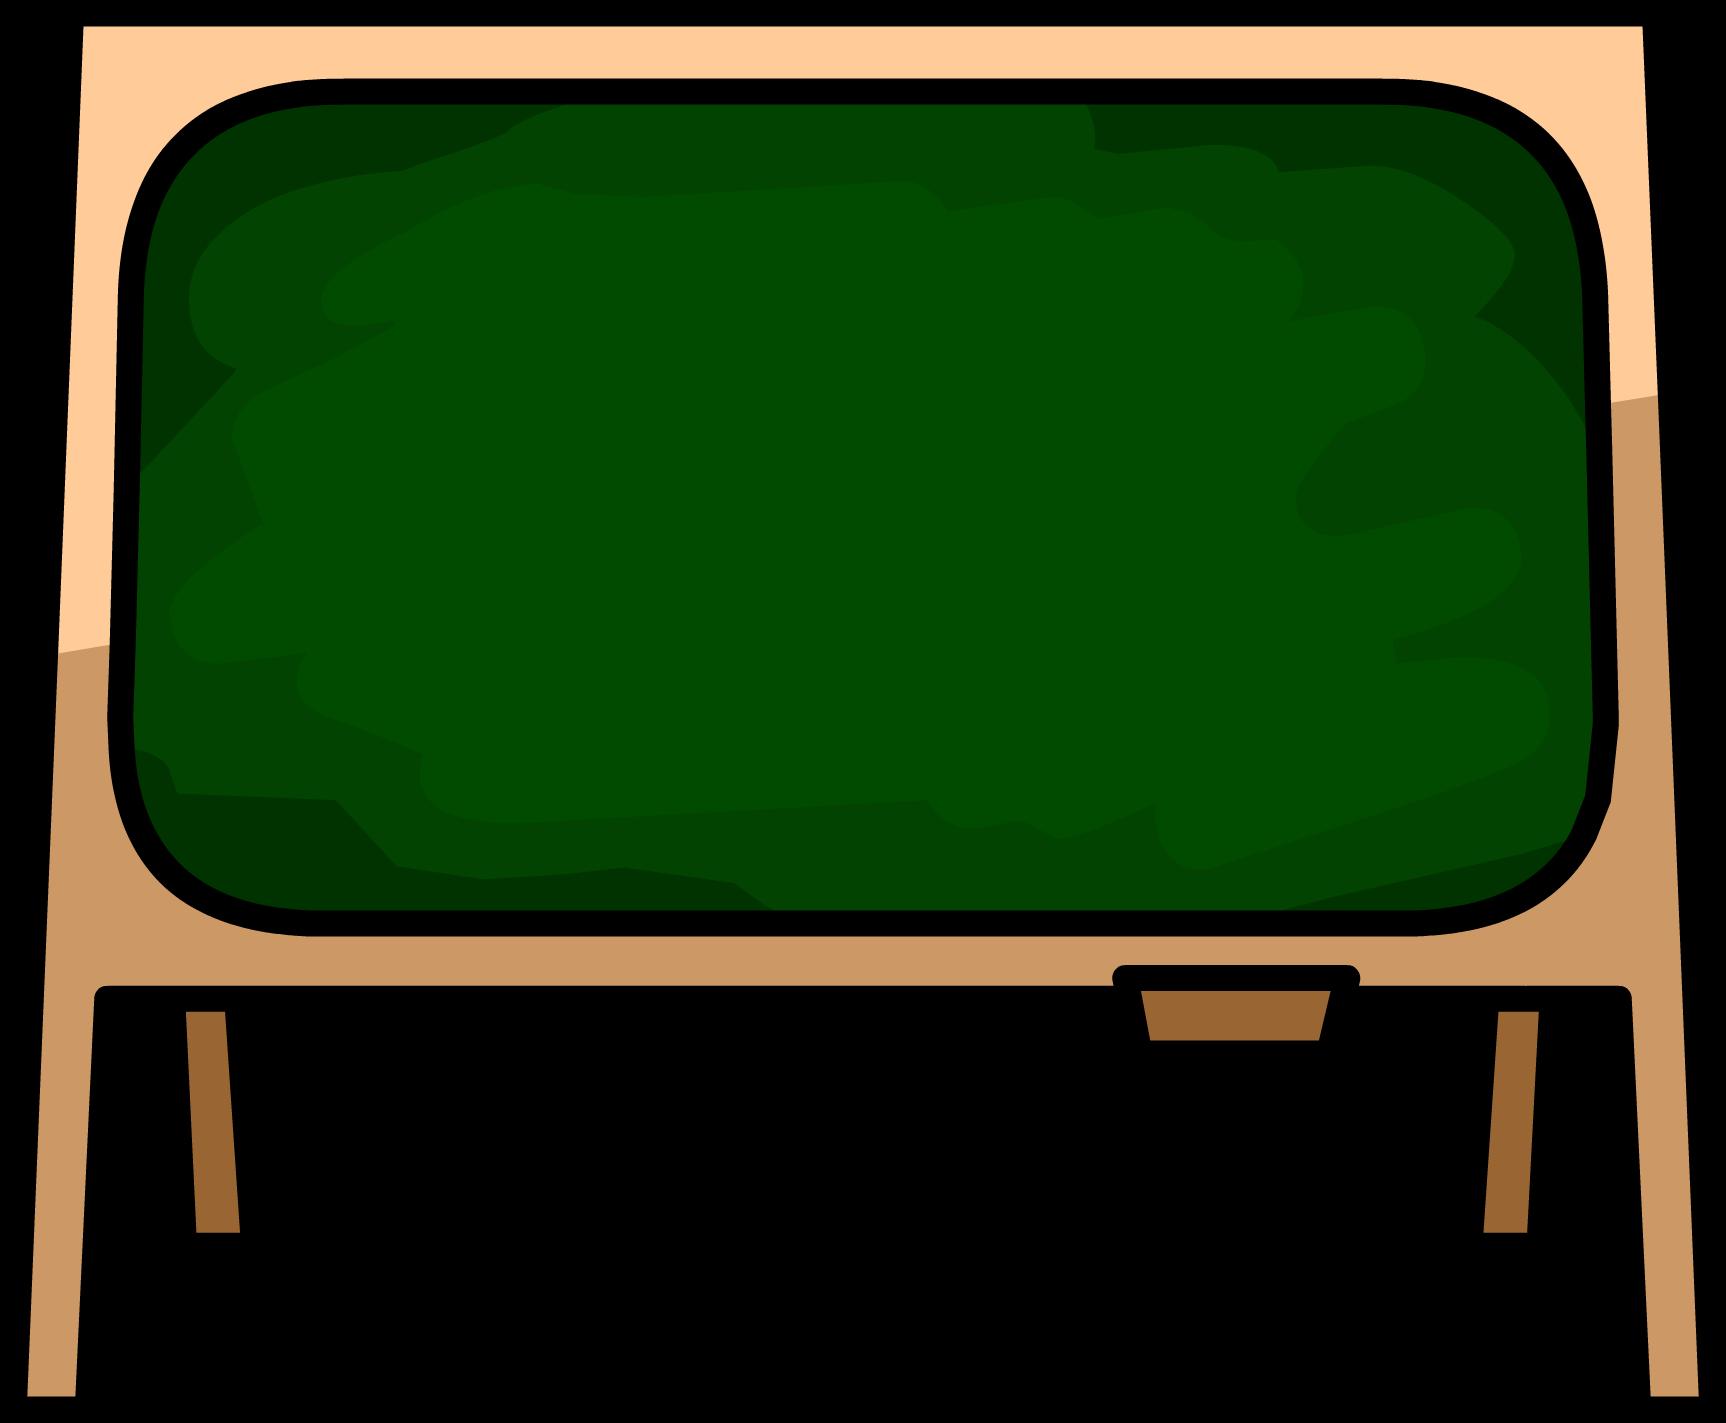 Igloo Chalk Board Club Penguin Wiki Fandom Powered By Wikia